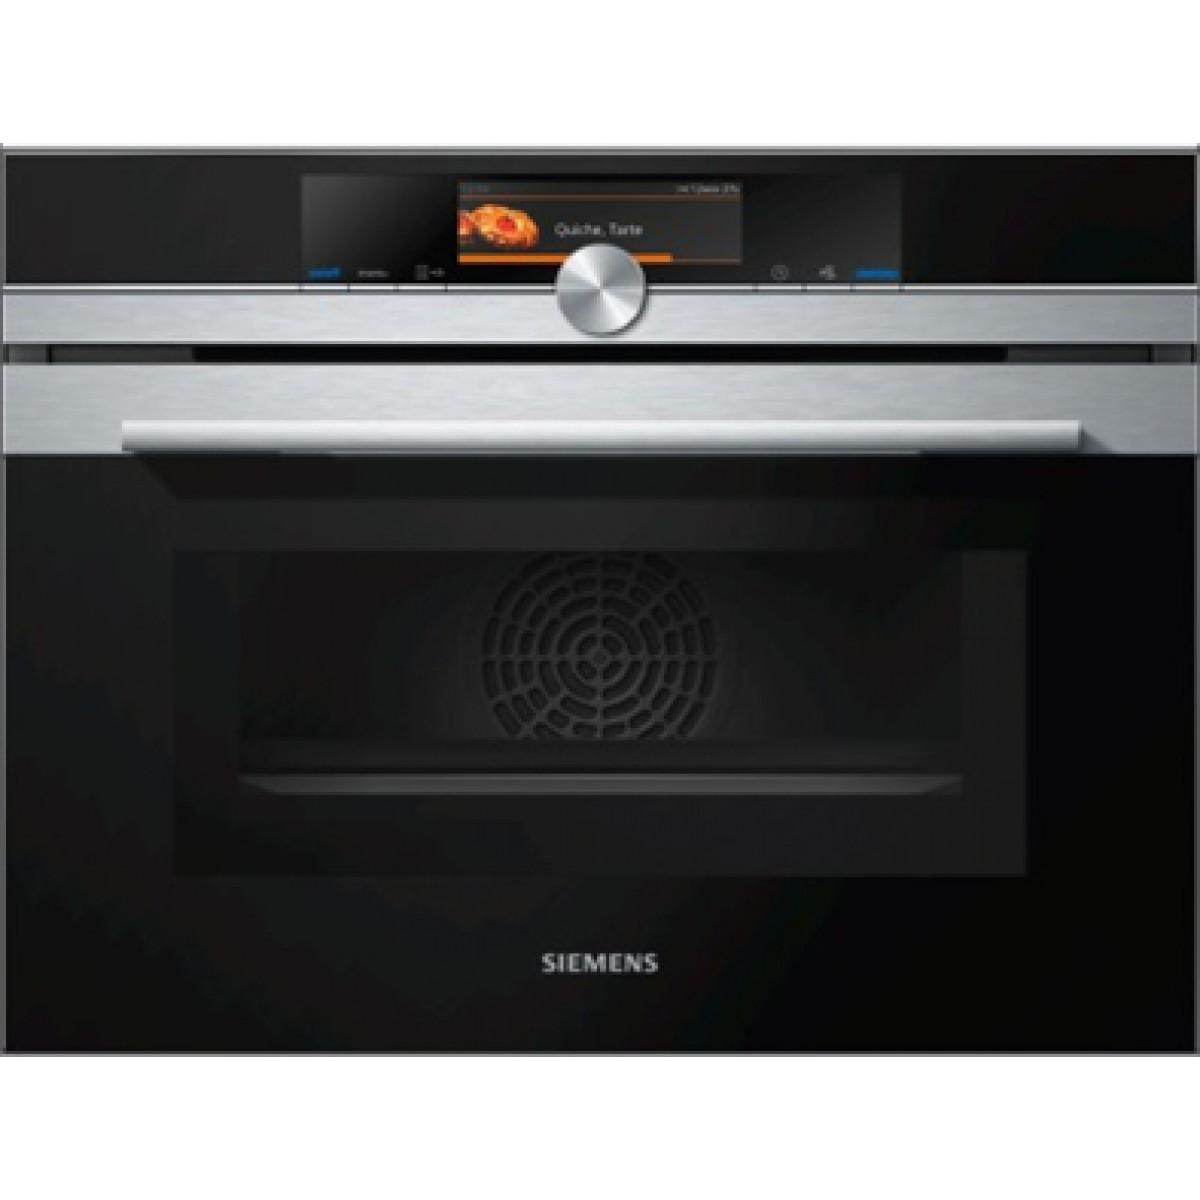 De Dietrich Kitchen Appliances De Dietrich Dom1195w Oven By Appliance World